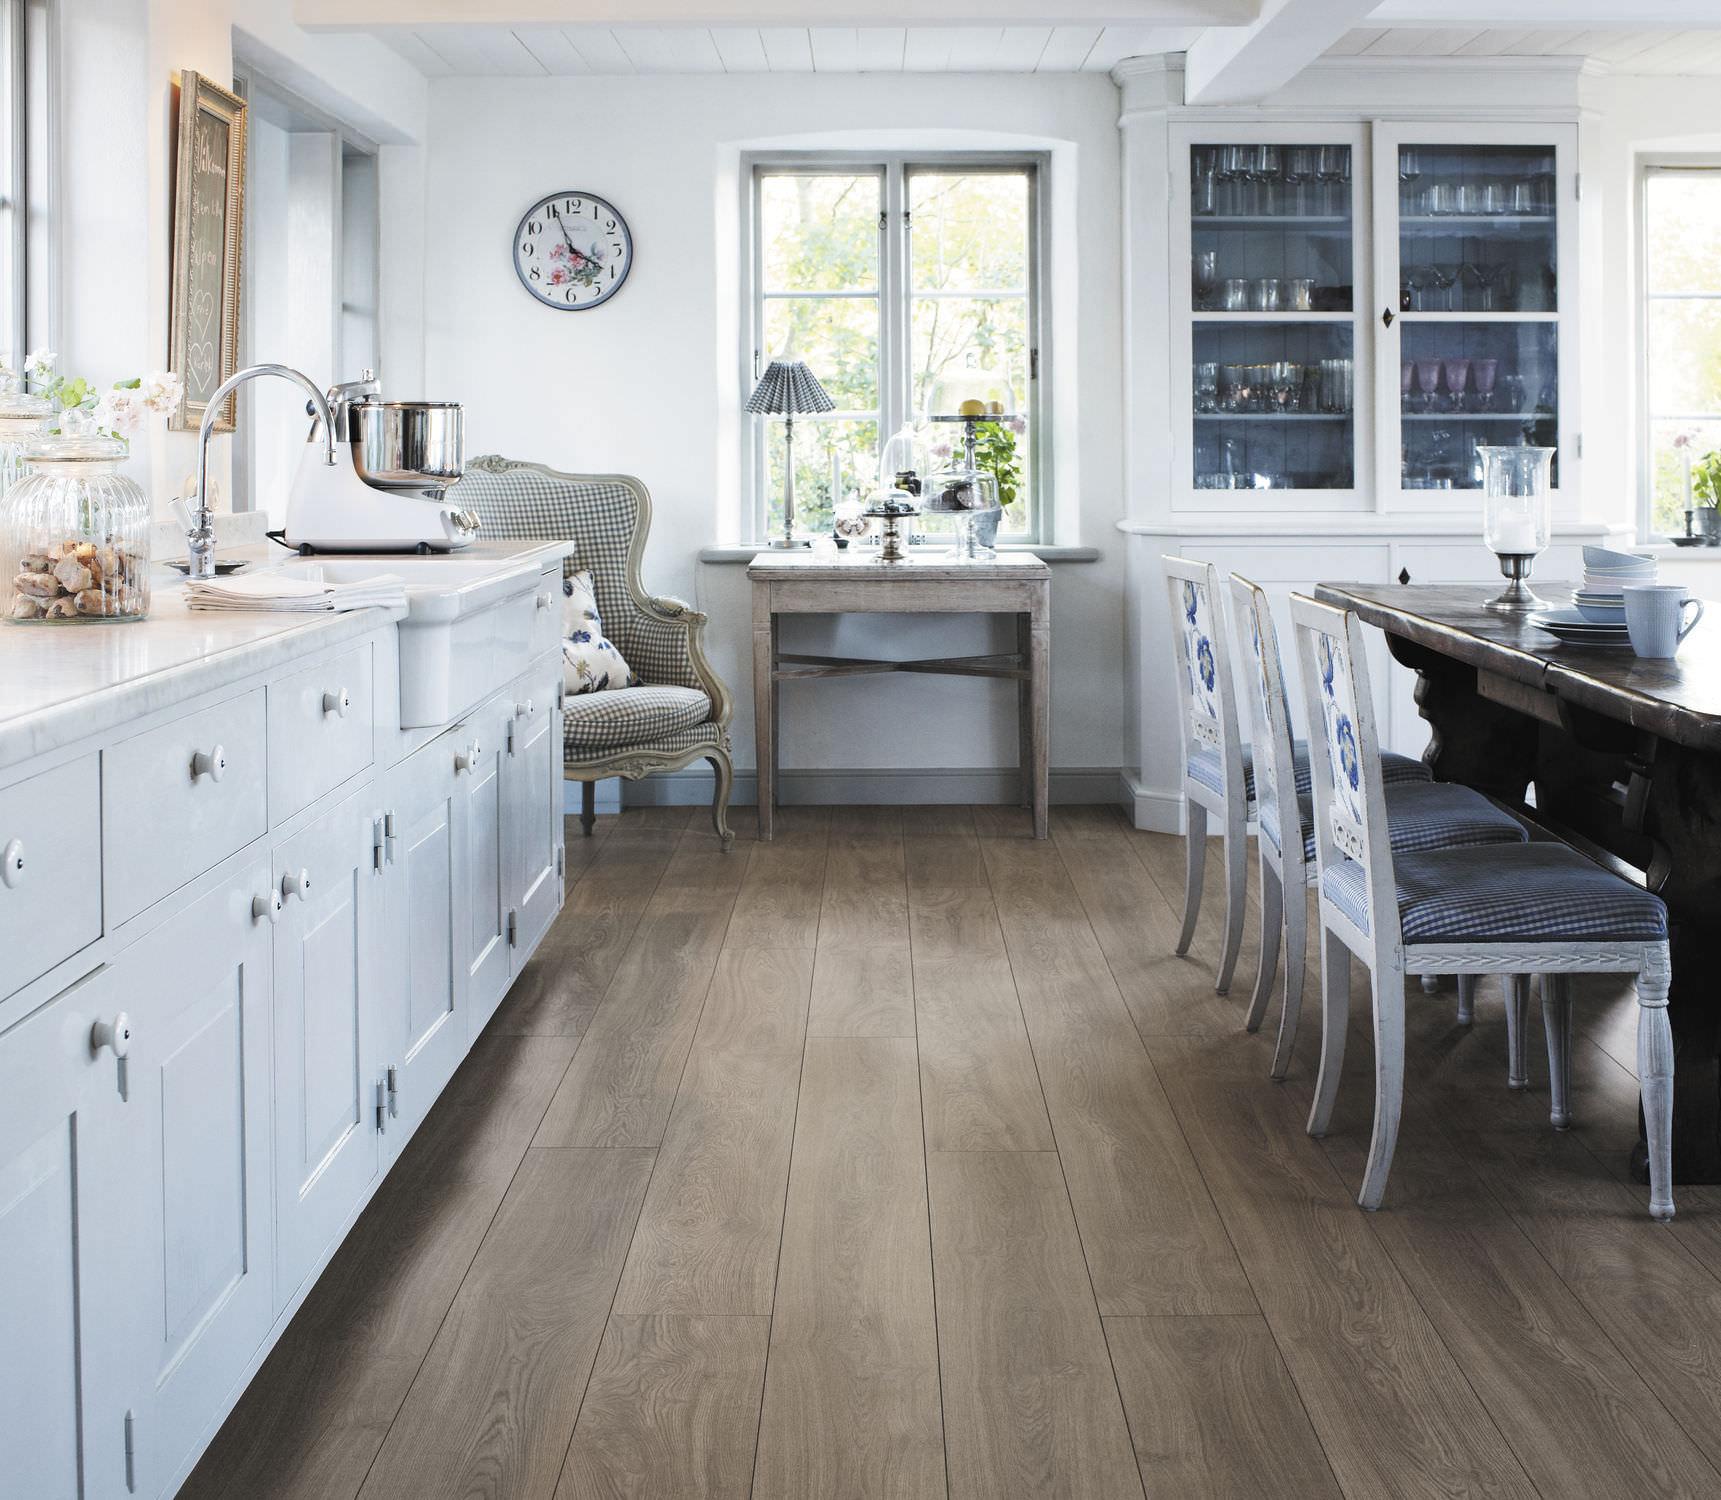 Laminate Flooring Wood Look hdf laminate flooring / click-fit / wood look / commercial - burnt